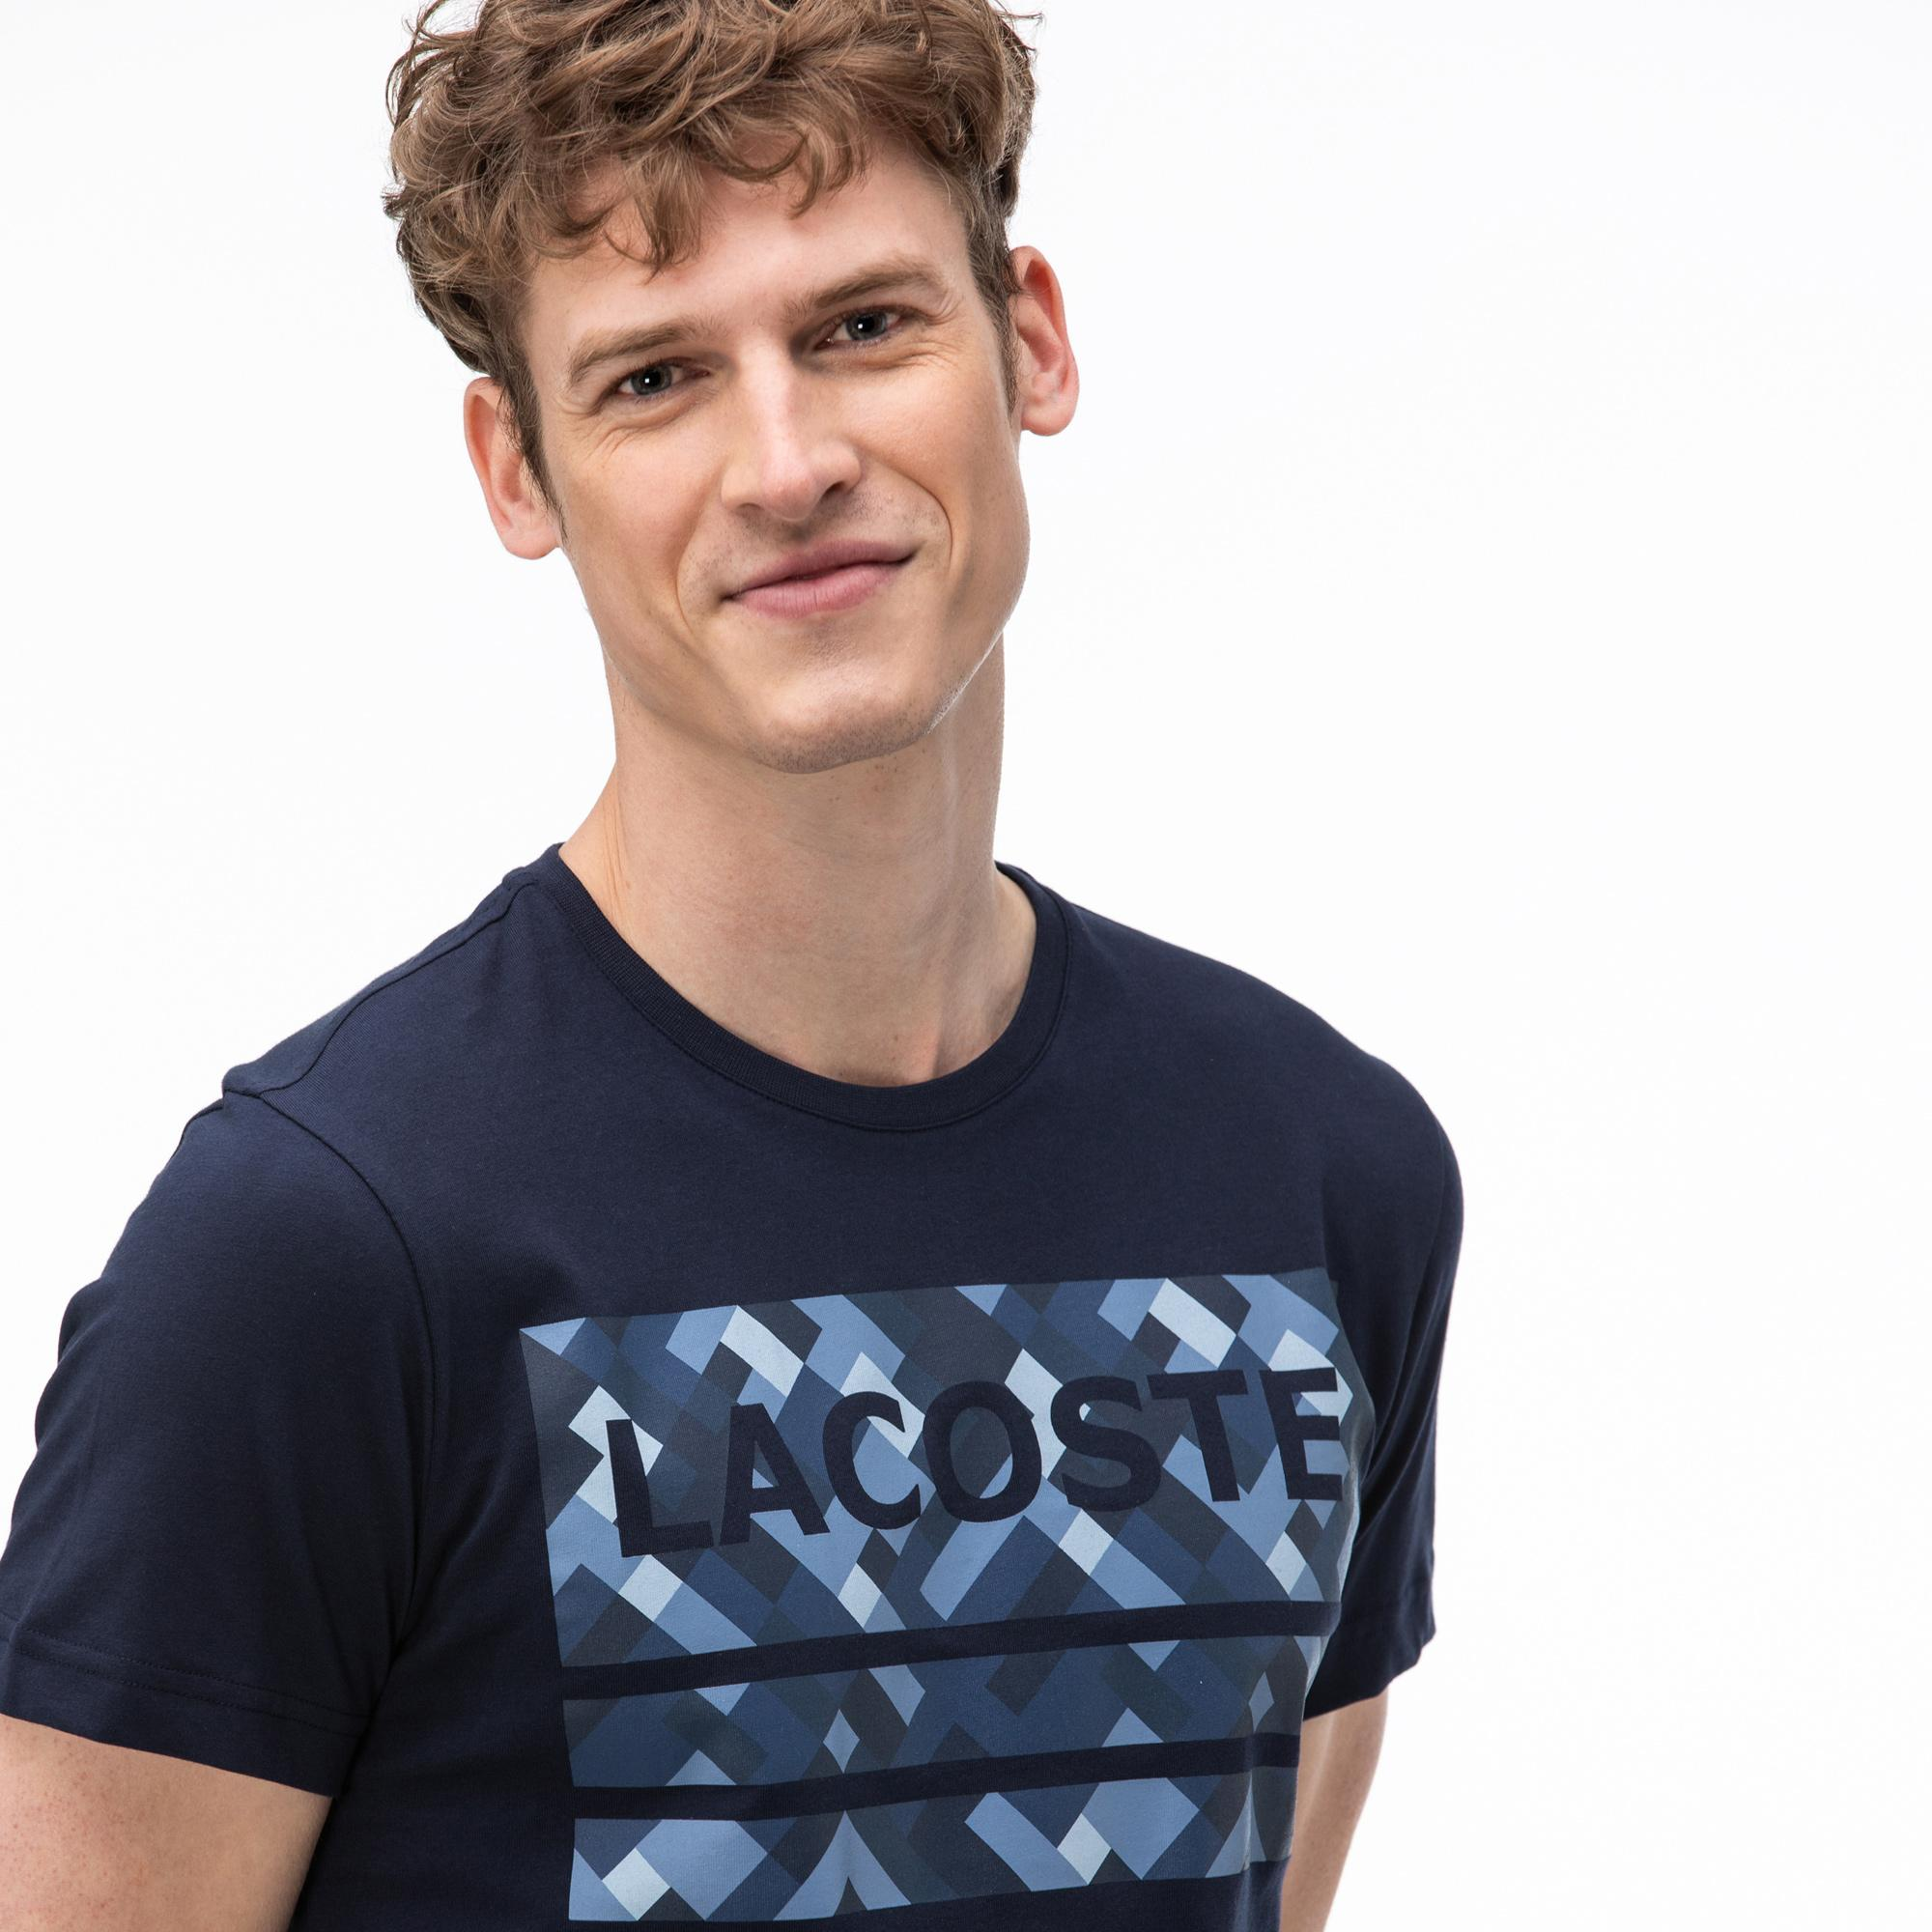 Lacoste Erkek Bisiklet Yaka Baskılı Lacivert T-Shirt